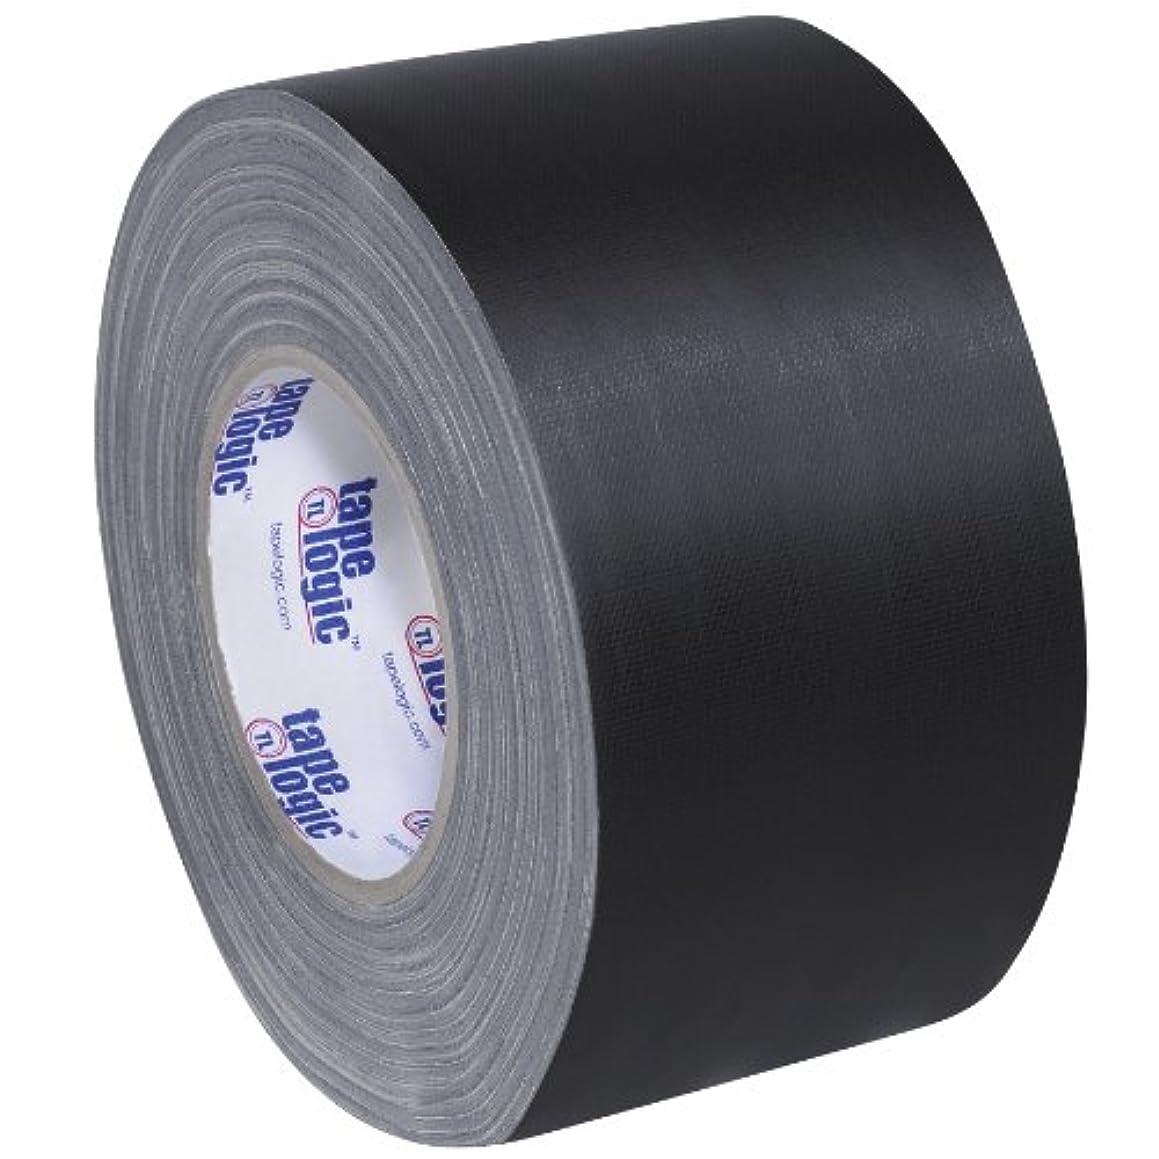 Tape Logic Gaffers Tape, 11 mil Thick, 60 yds. x 3